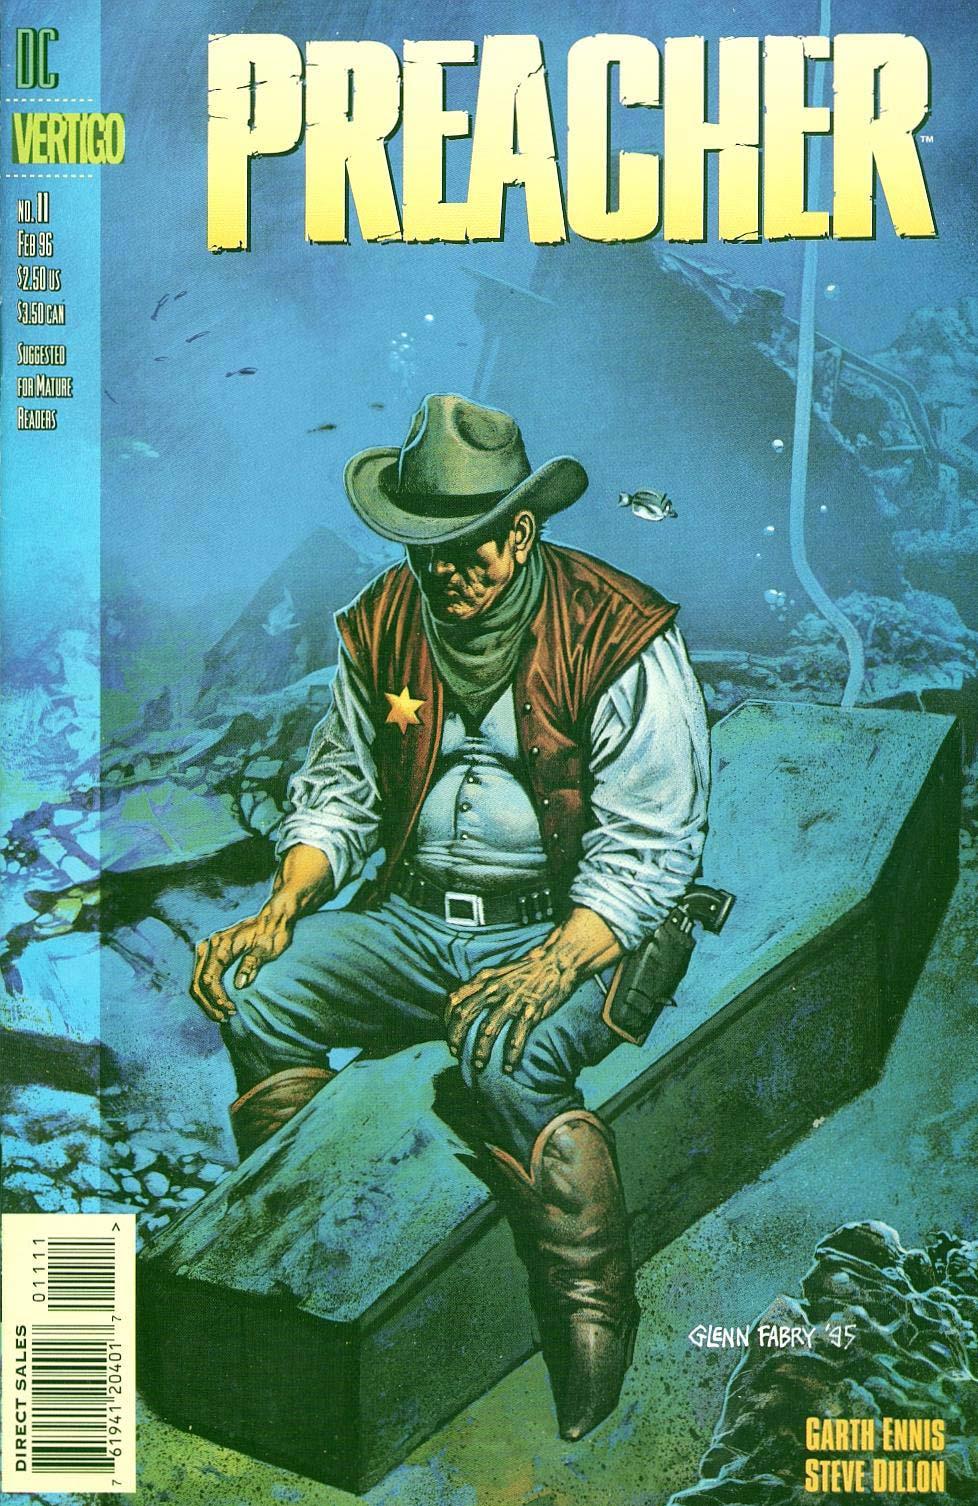 Комиксы Онлайн - Проповедник - # 11 - Страница №1 - Preacher - Preacher # 11